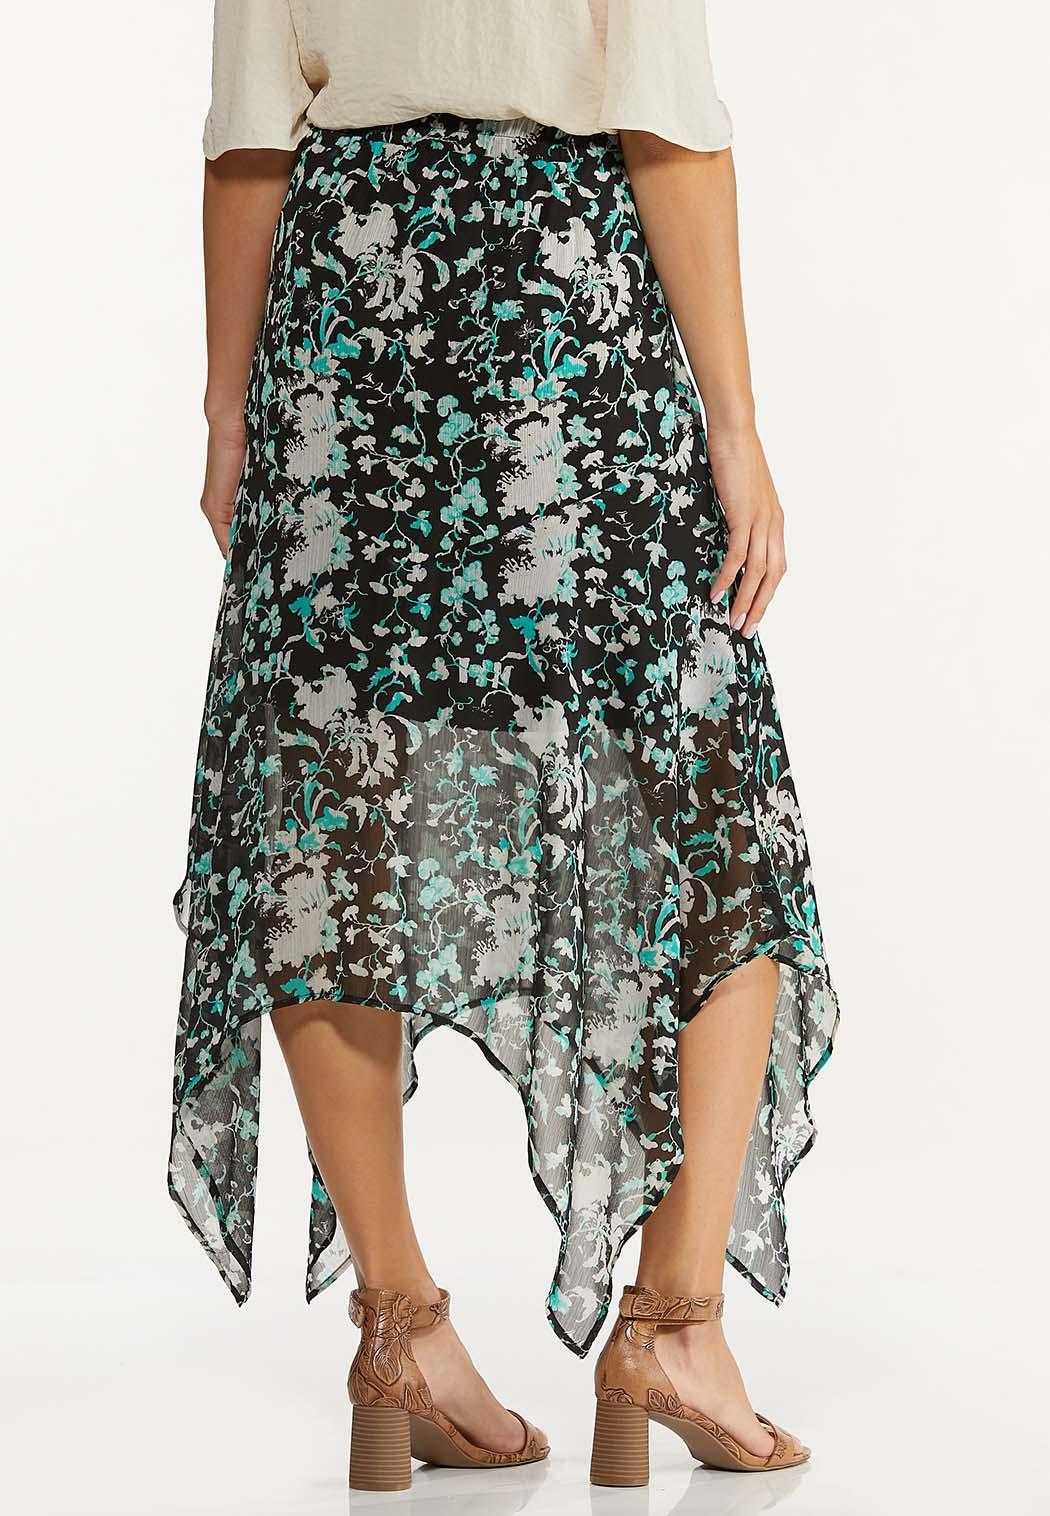 Plus Size Textured Floral Hanky Hem Skirt (Item #44624007)